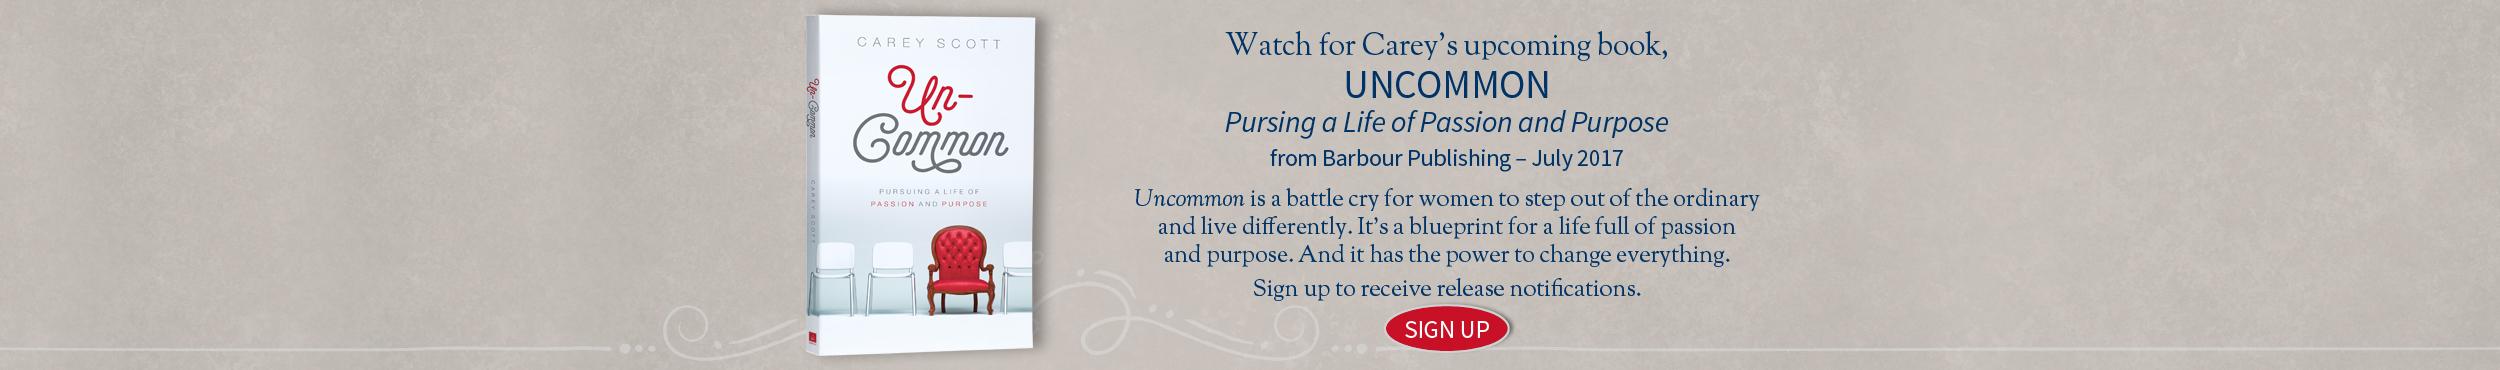 Carey Scott - Uncommon Book